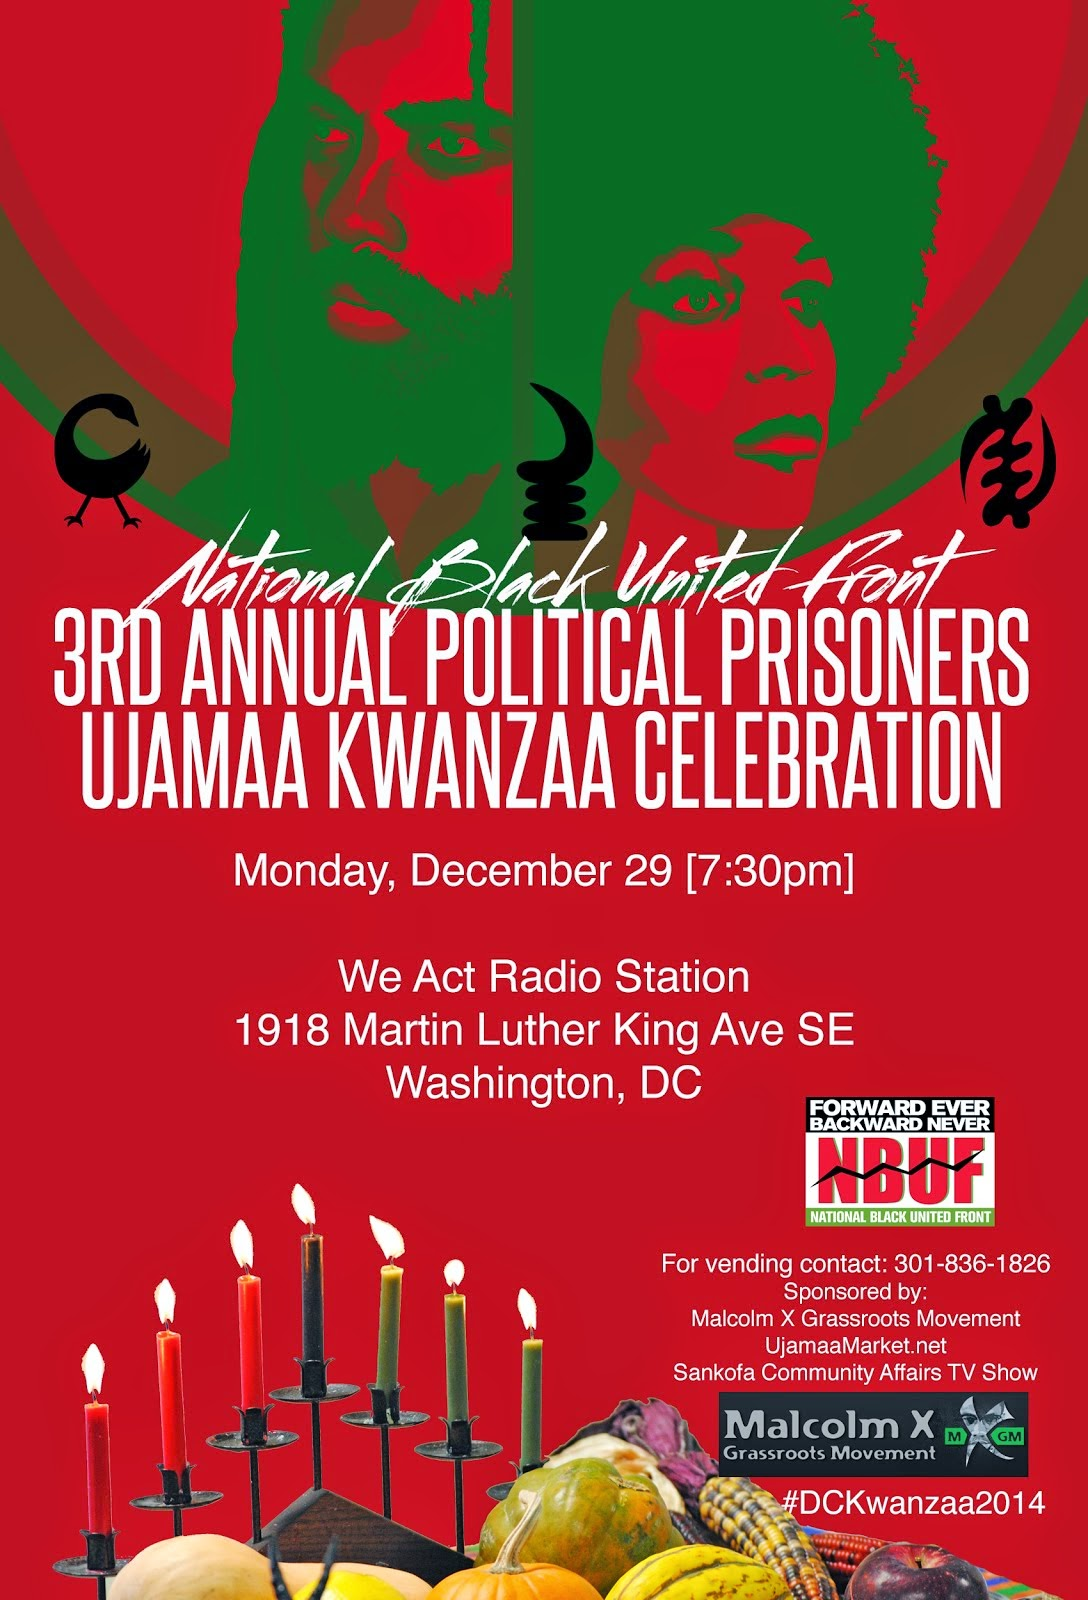 Kwanzaa Political Prisoners